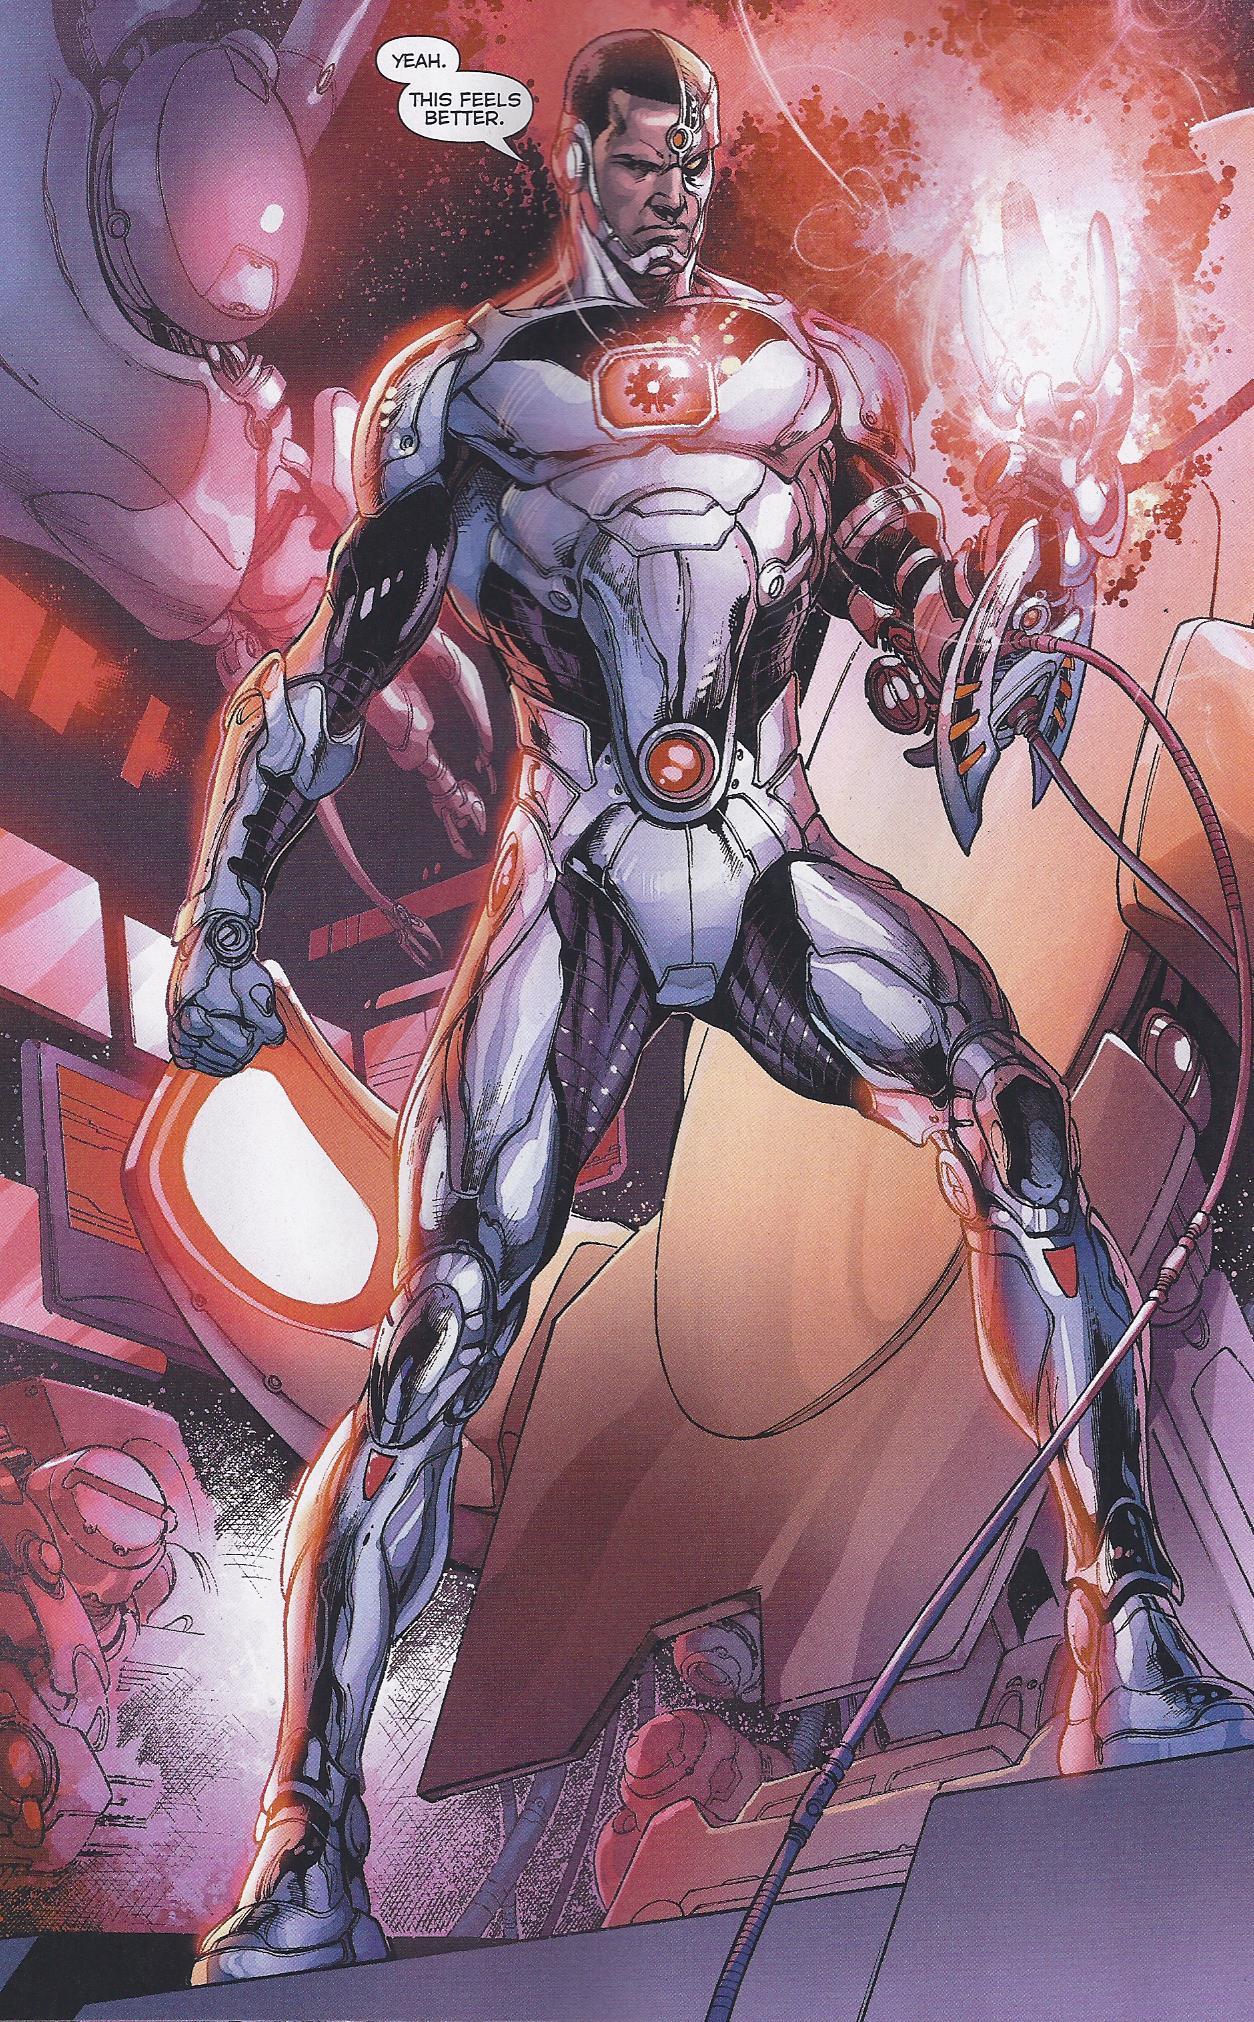 http://insidepulse.com/wp-content/uploads/2014/01/Justice-League-27-Forever-Evil-Spoilers-art-6.jpg